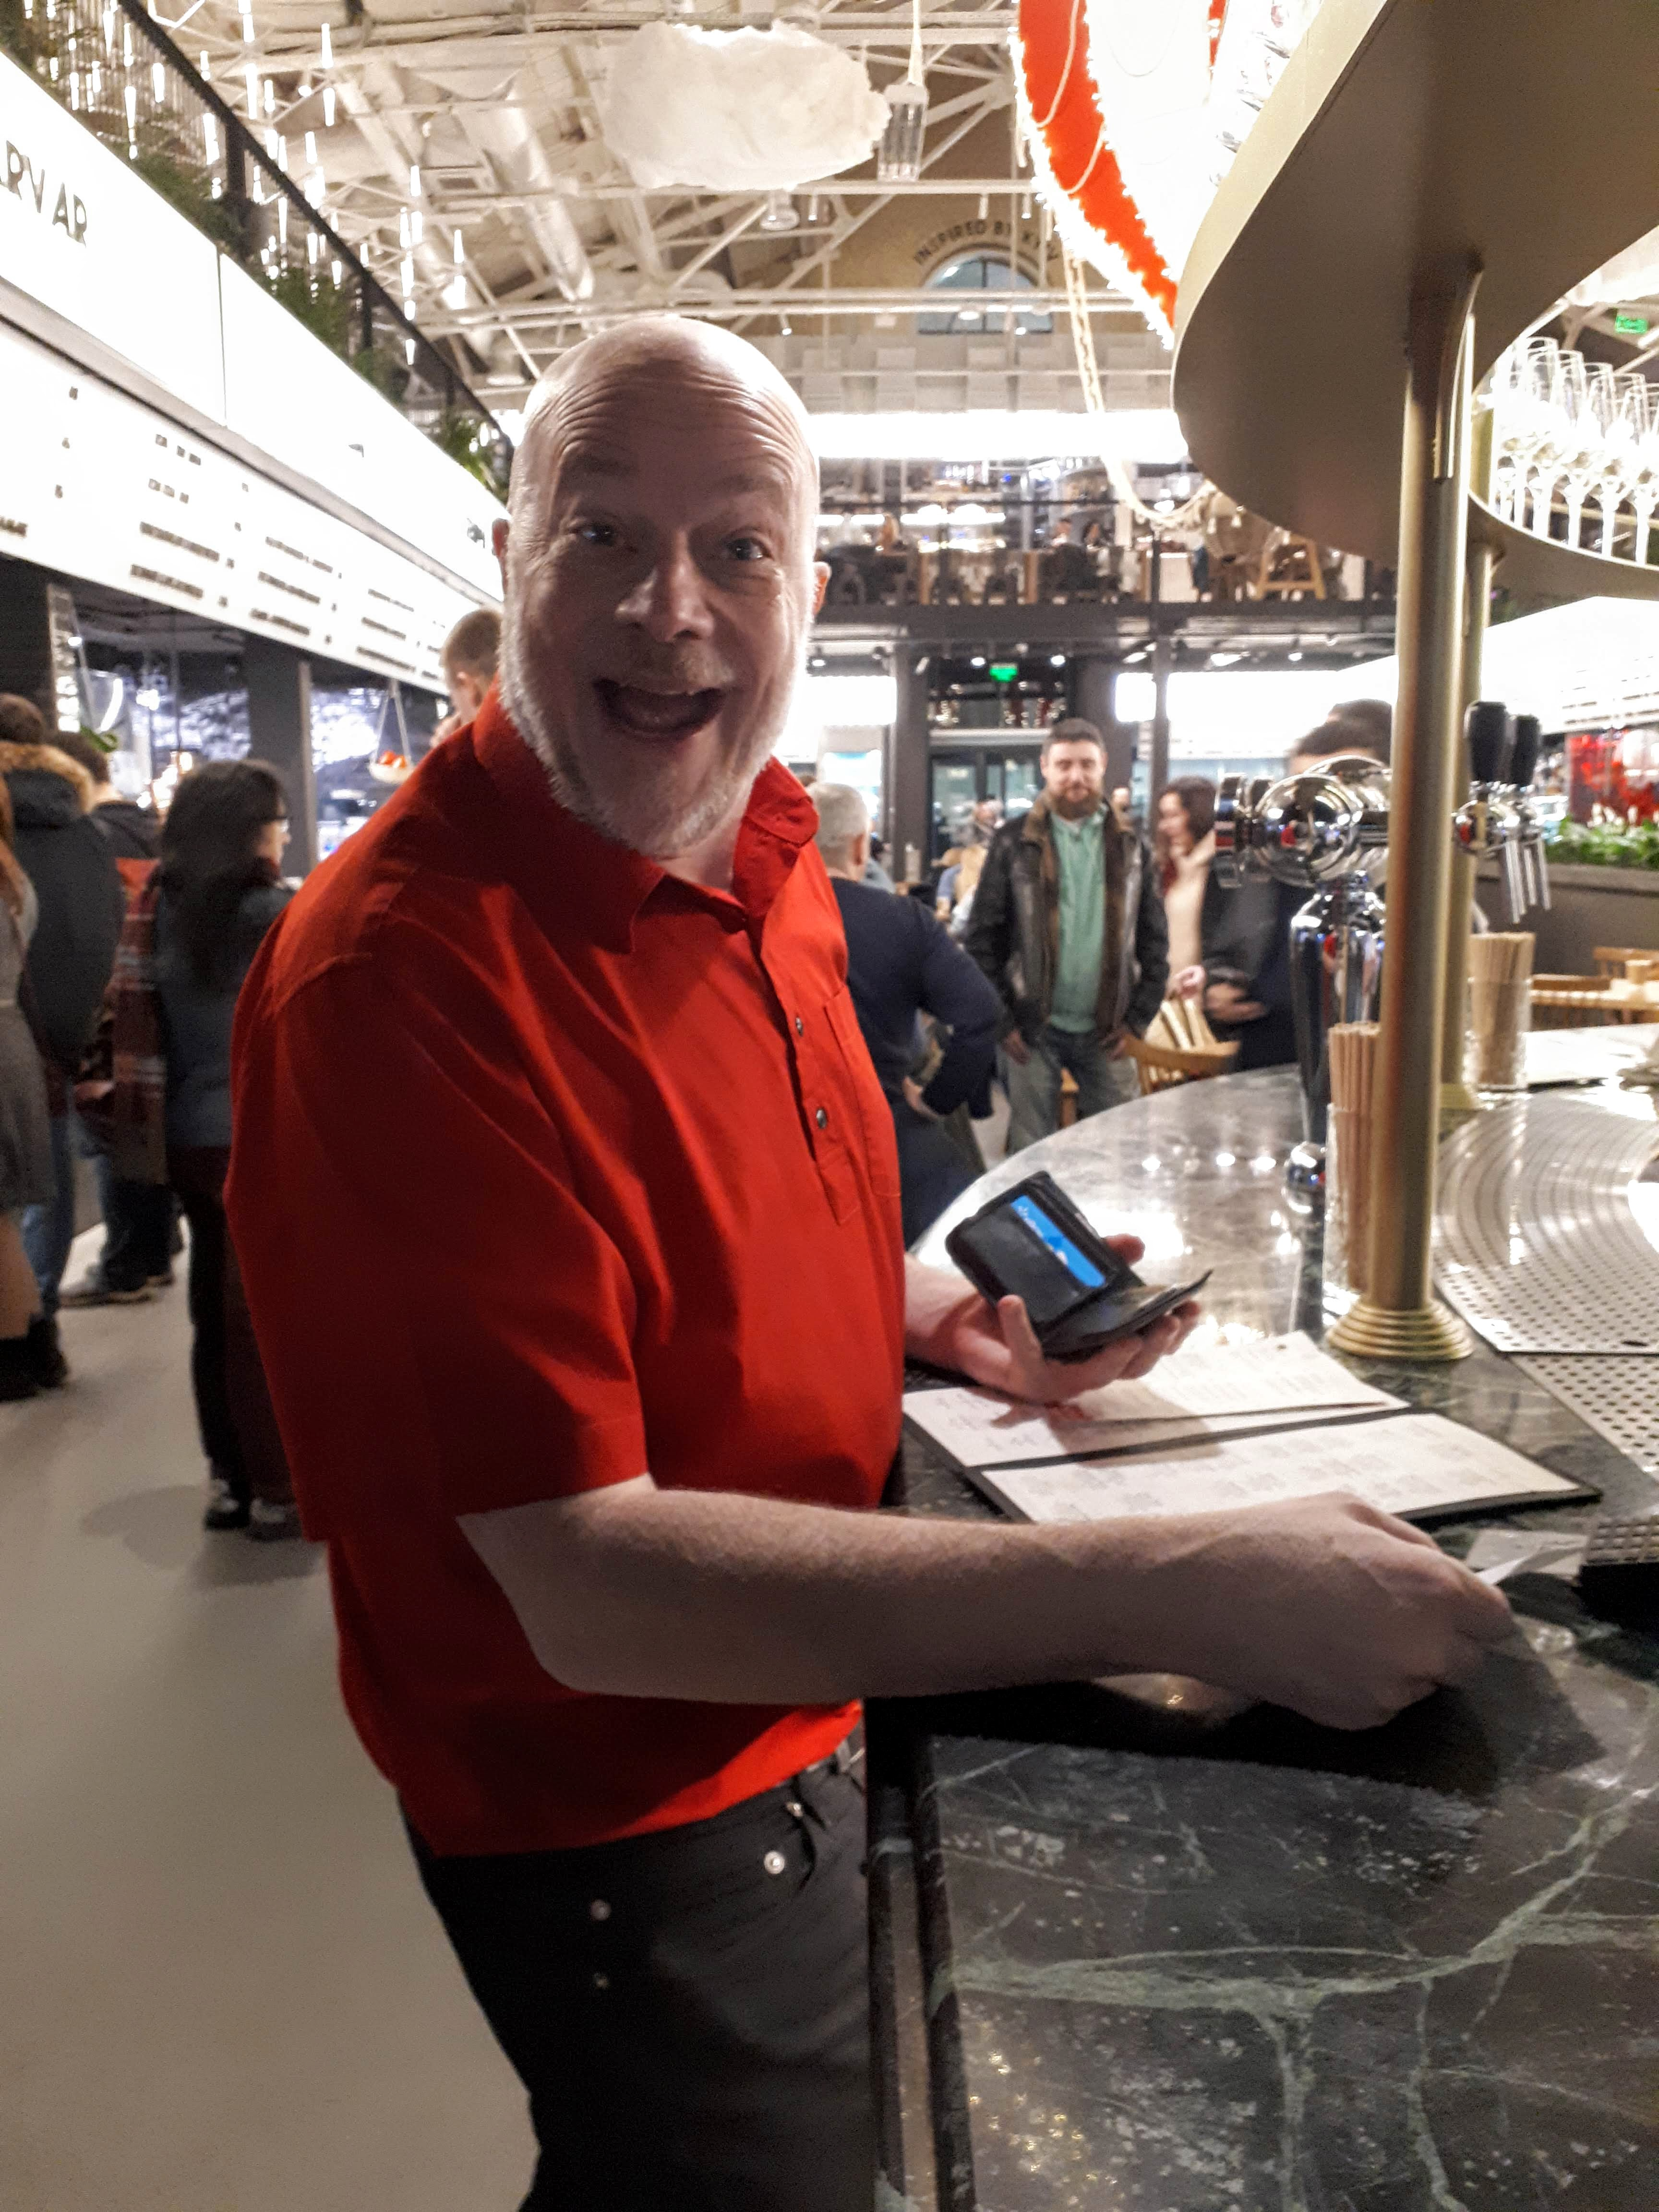 Smiling Jason in Kyiv food market